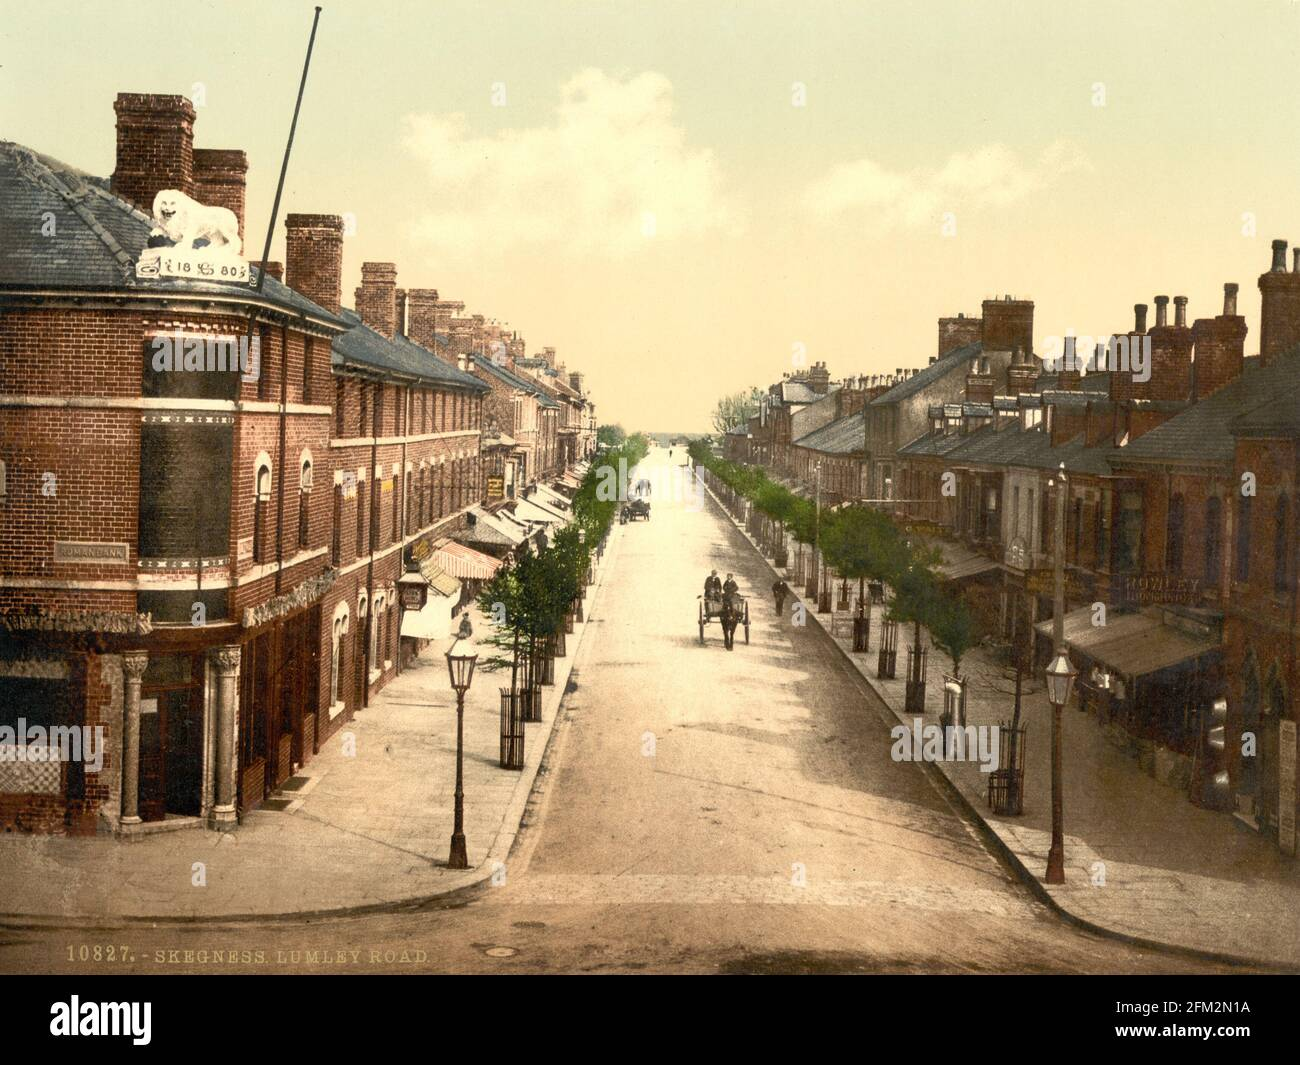 Lumley Road dans Skegness, Lincolnshire vers 1890-1900 Banque D'Images